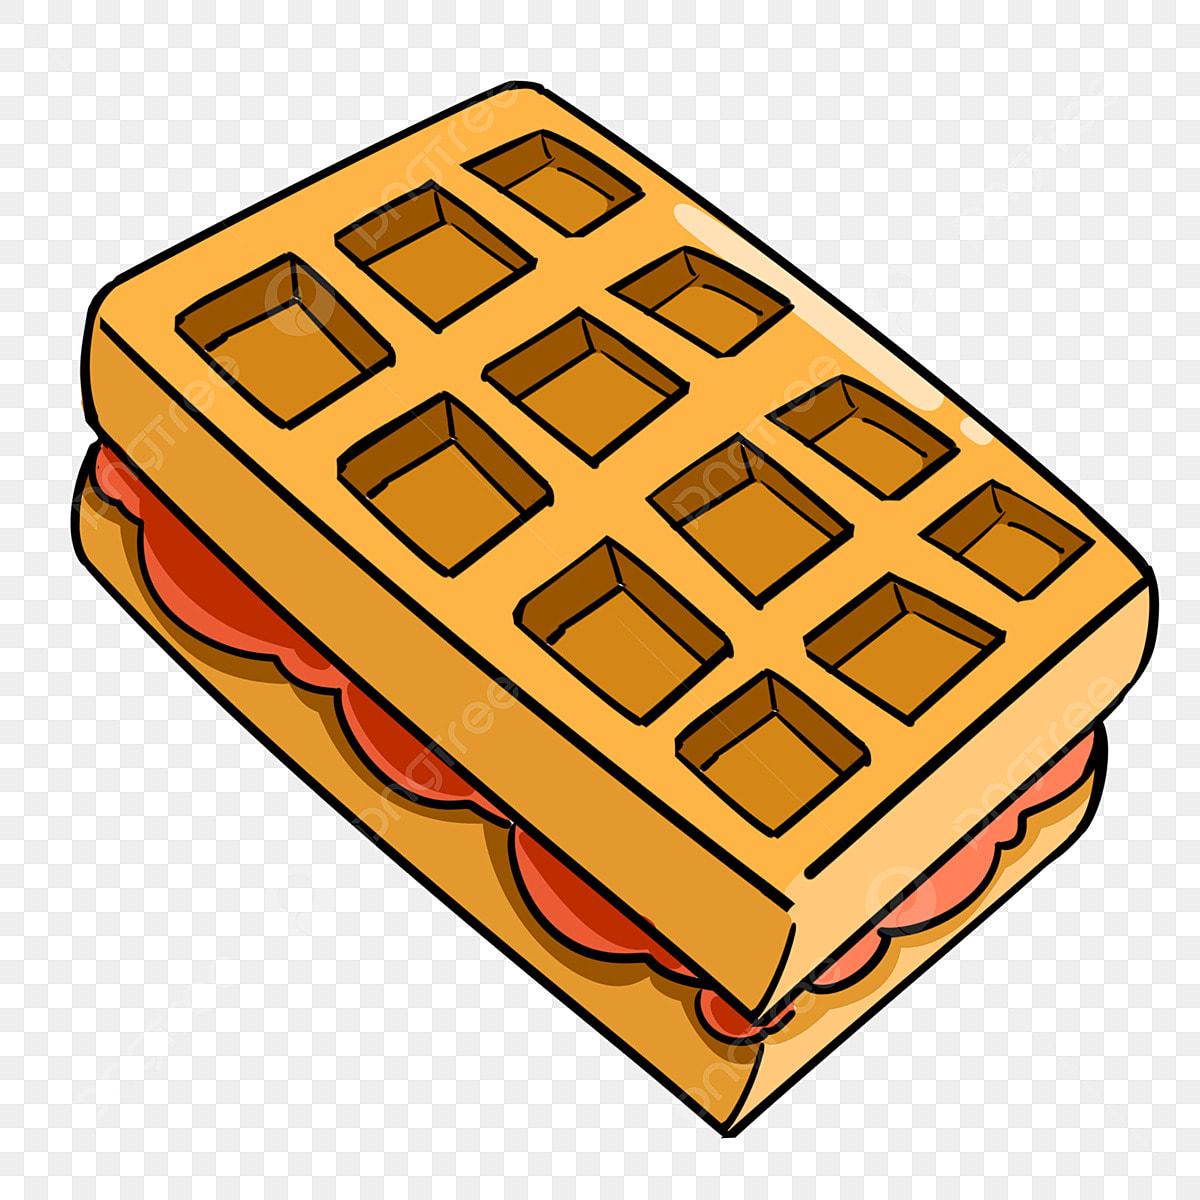 Sandwich Waffle Cookie Illustration Sandwich Biscuits Waffles